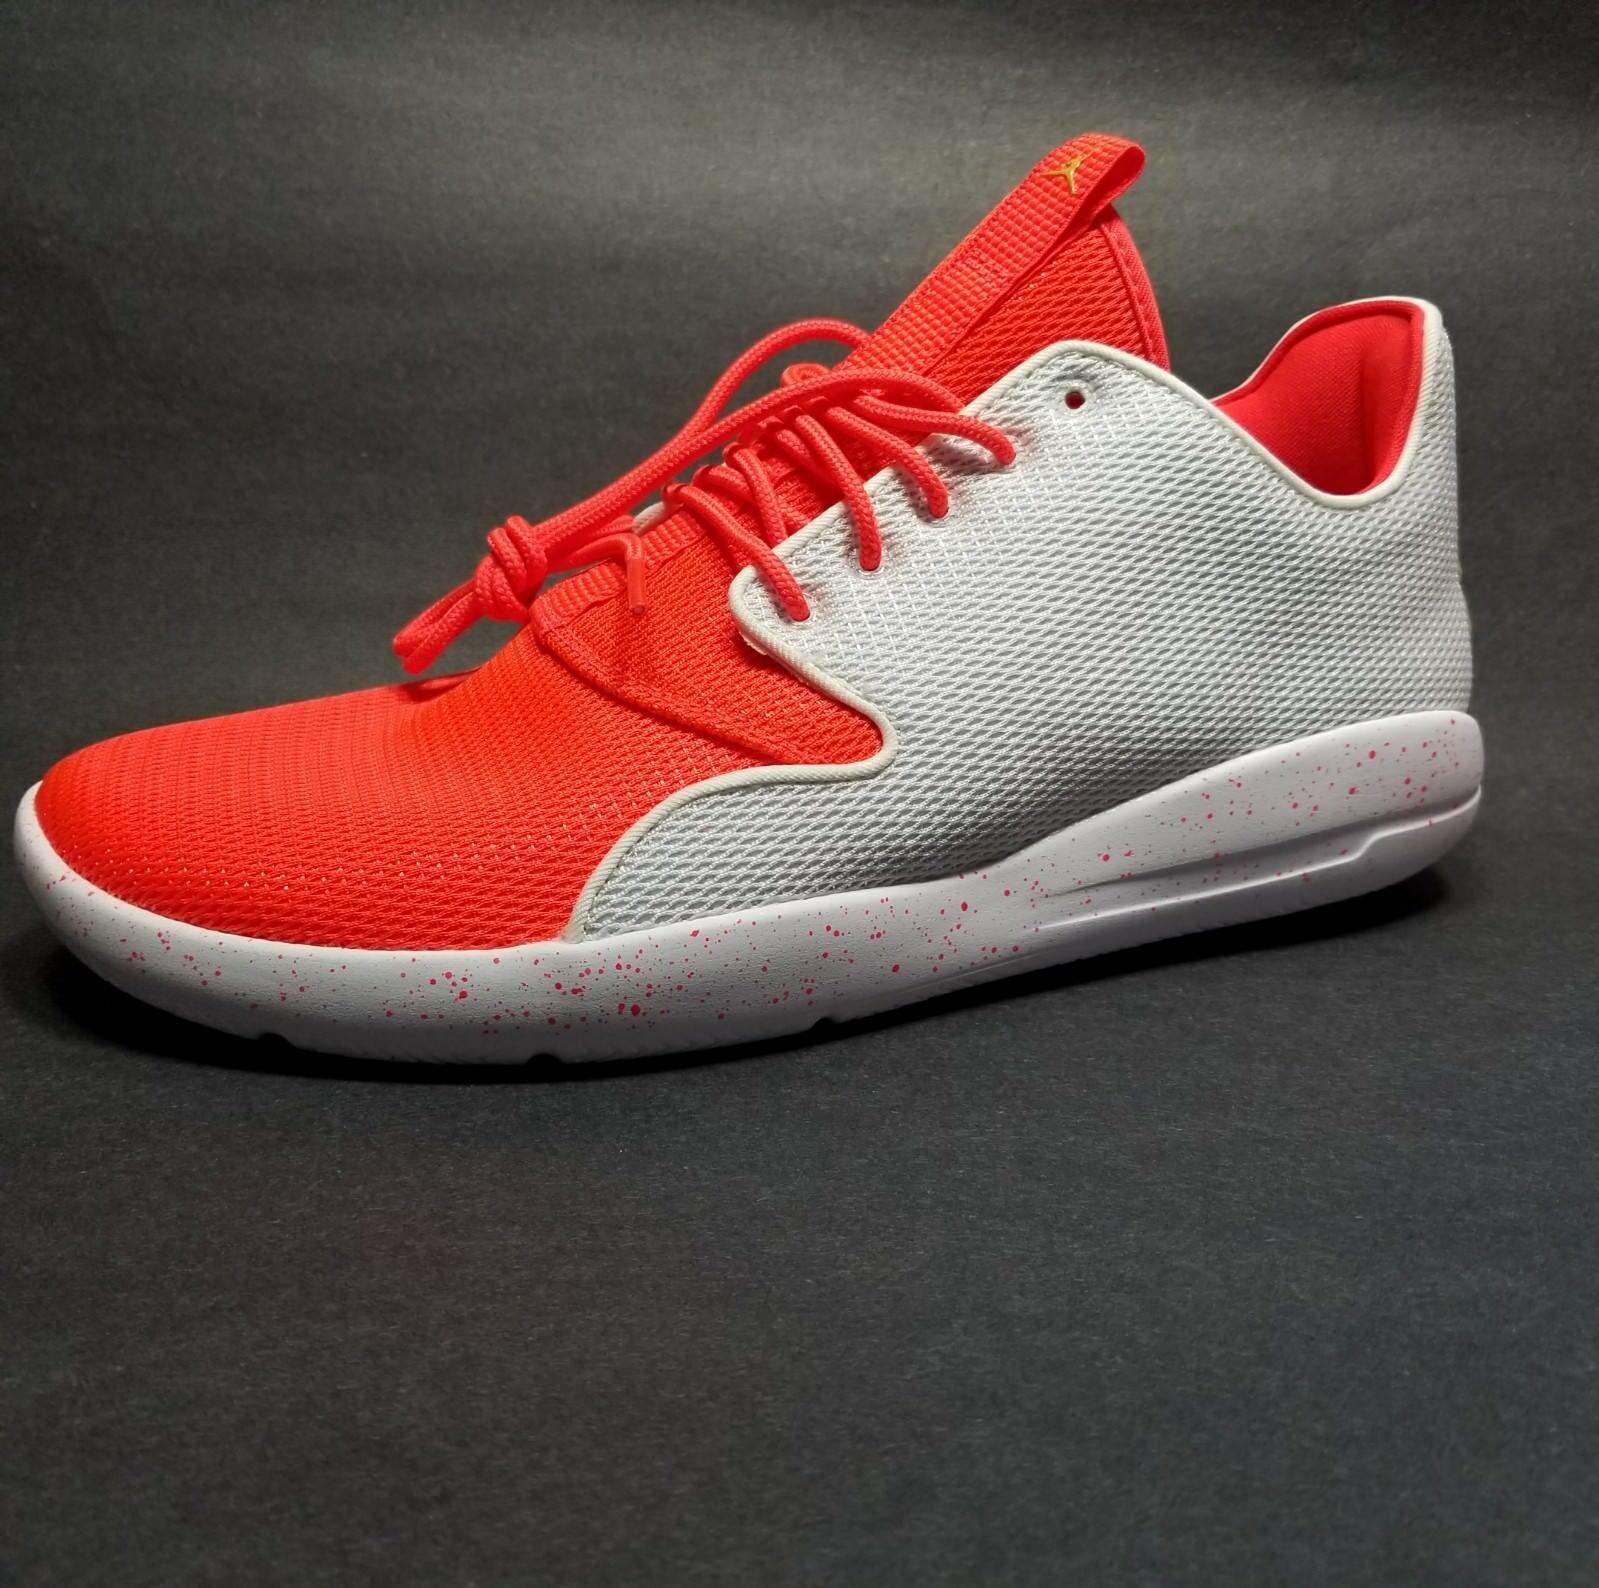 NIKE Jordan Mens Air Jordan NIKE Eclipse  724010-126 Size 9.5 New with Box 87db74